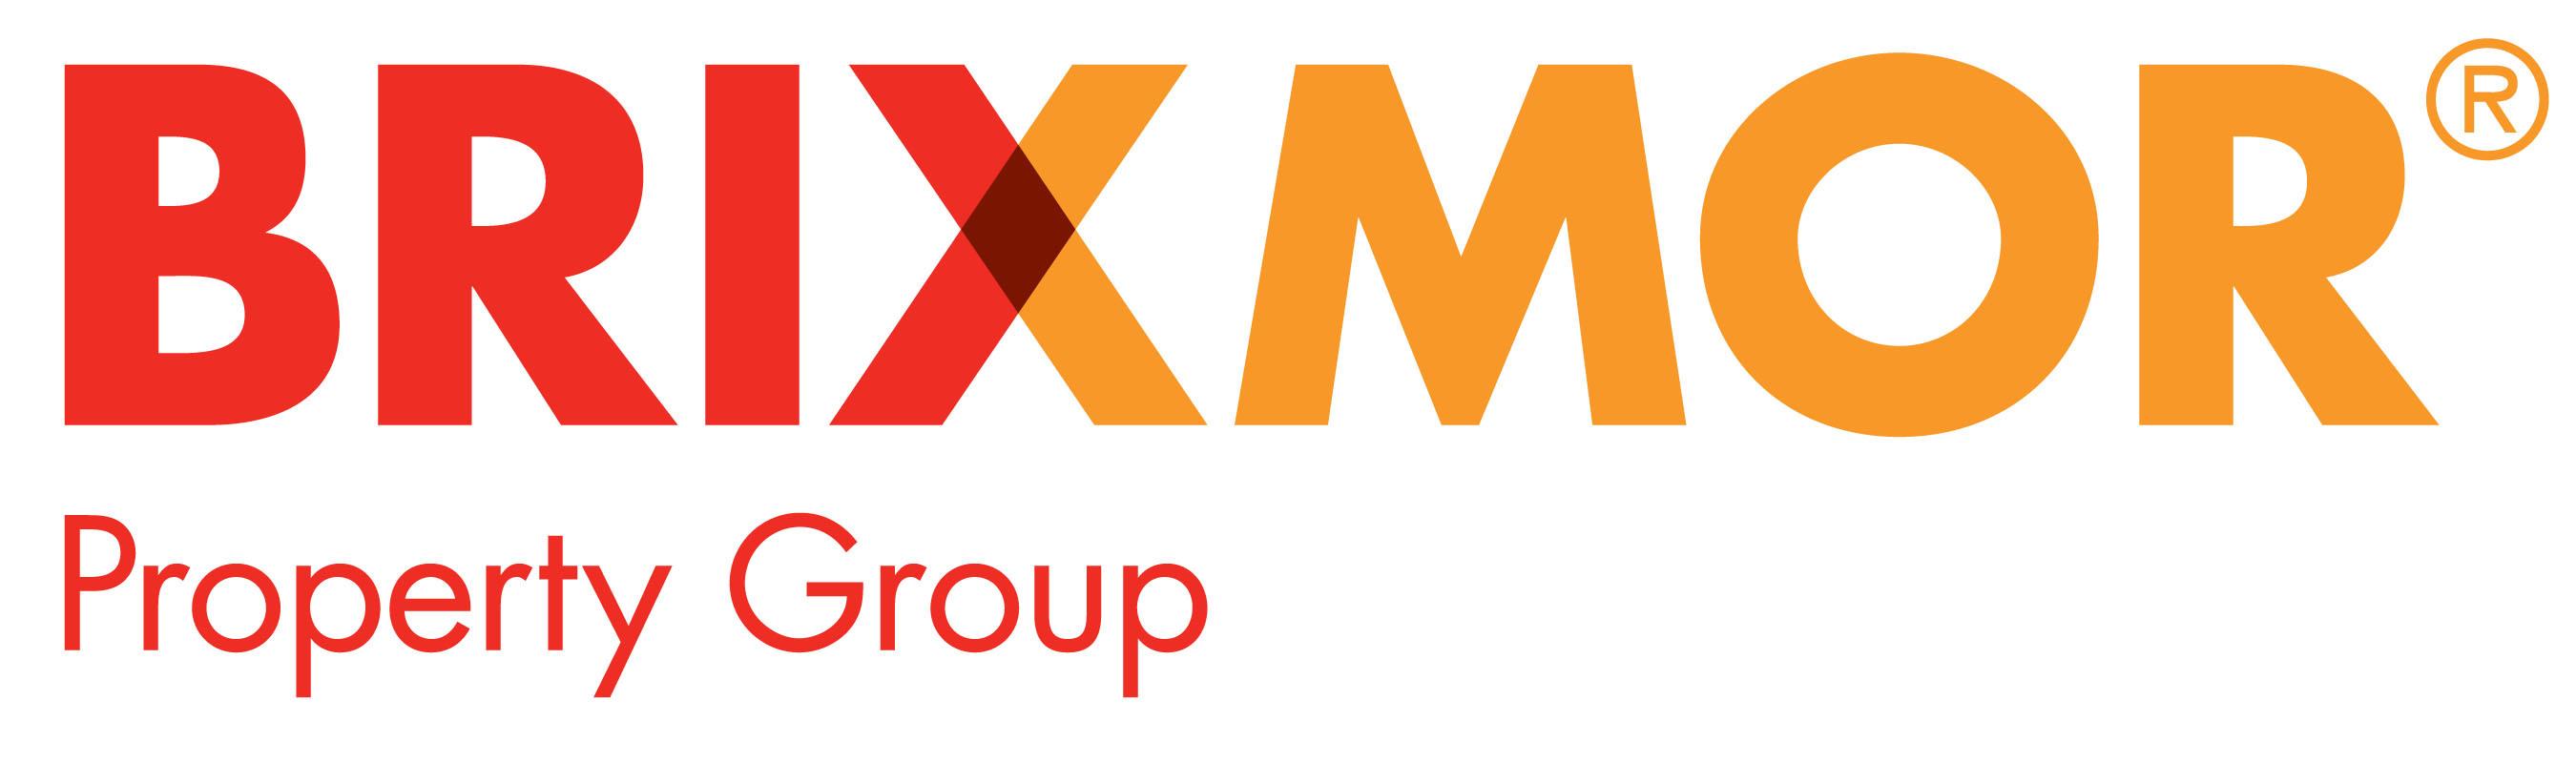 Brixmor Property Group Logo